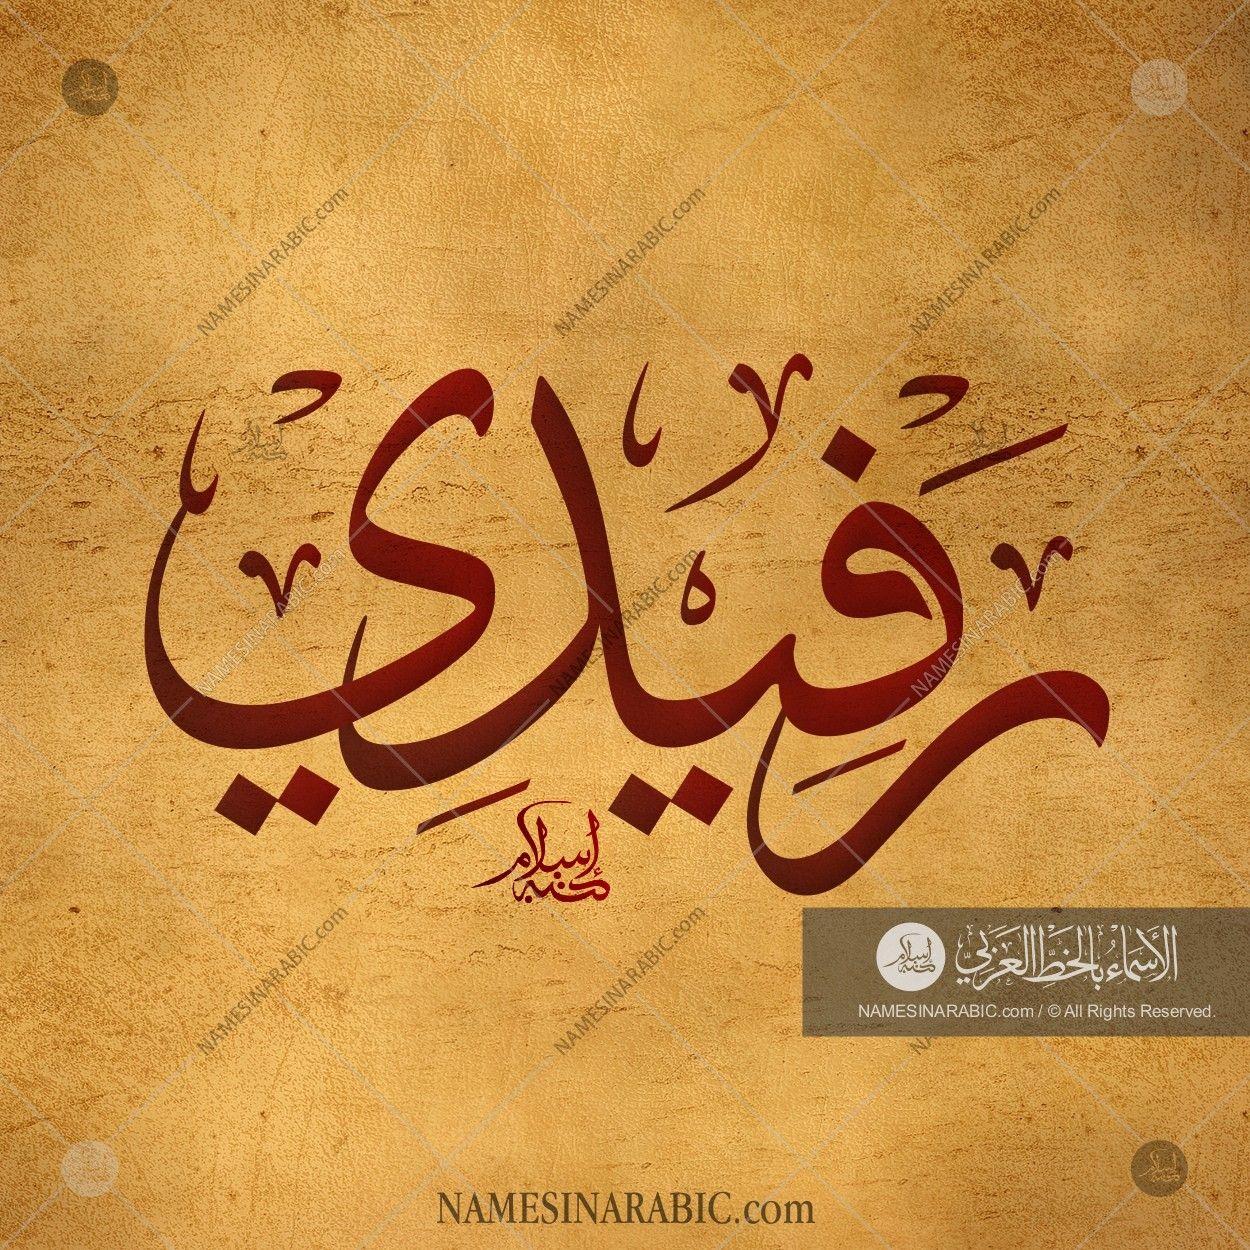 Rafedi رفيدي Names In Arabic Calligraphy Name 3442 Calligraphy Name Calligraphy Arabic